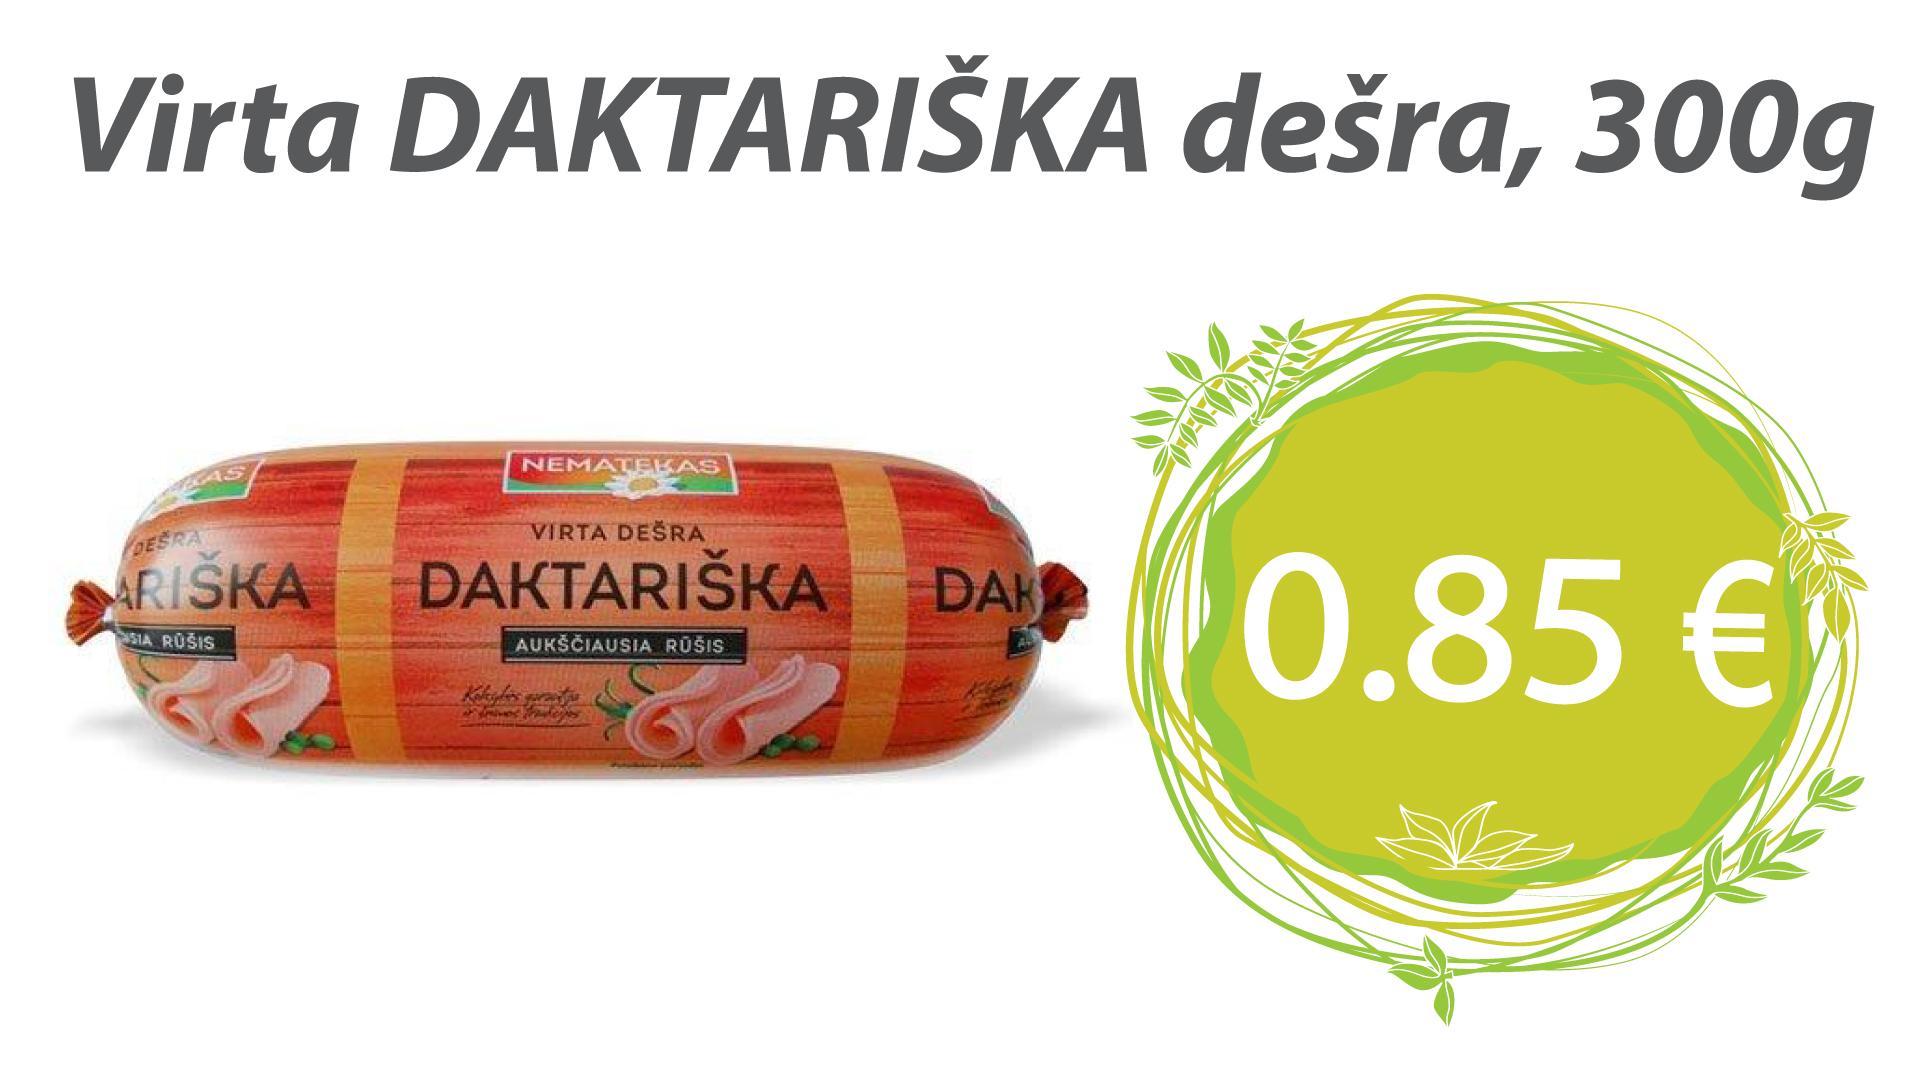 Virta-DAKTARISKA-desra-nematekas